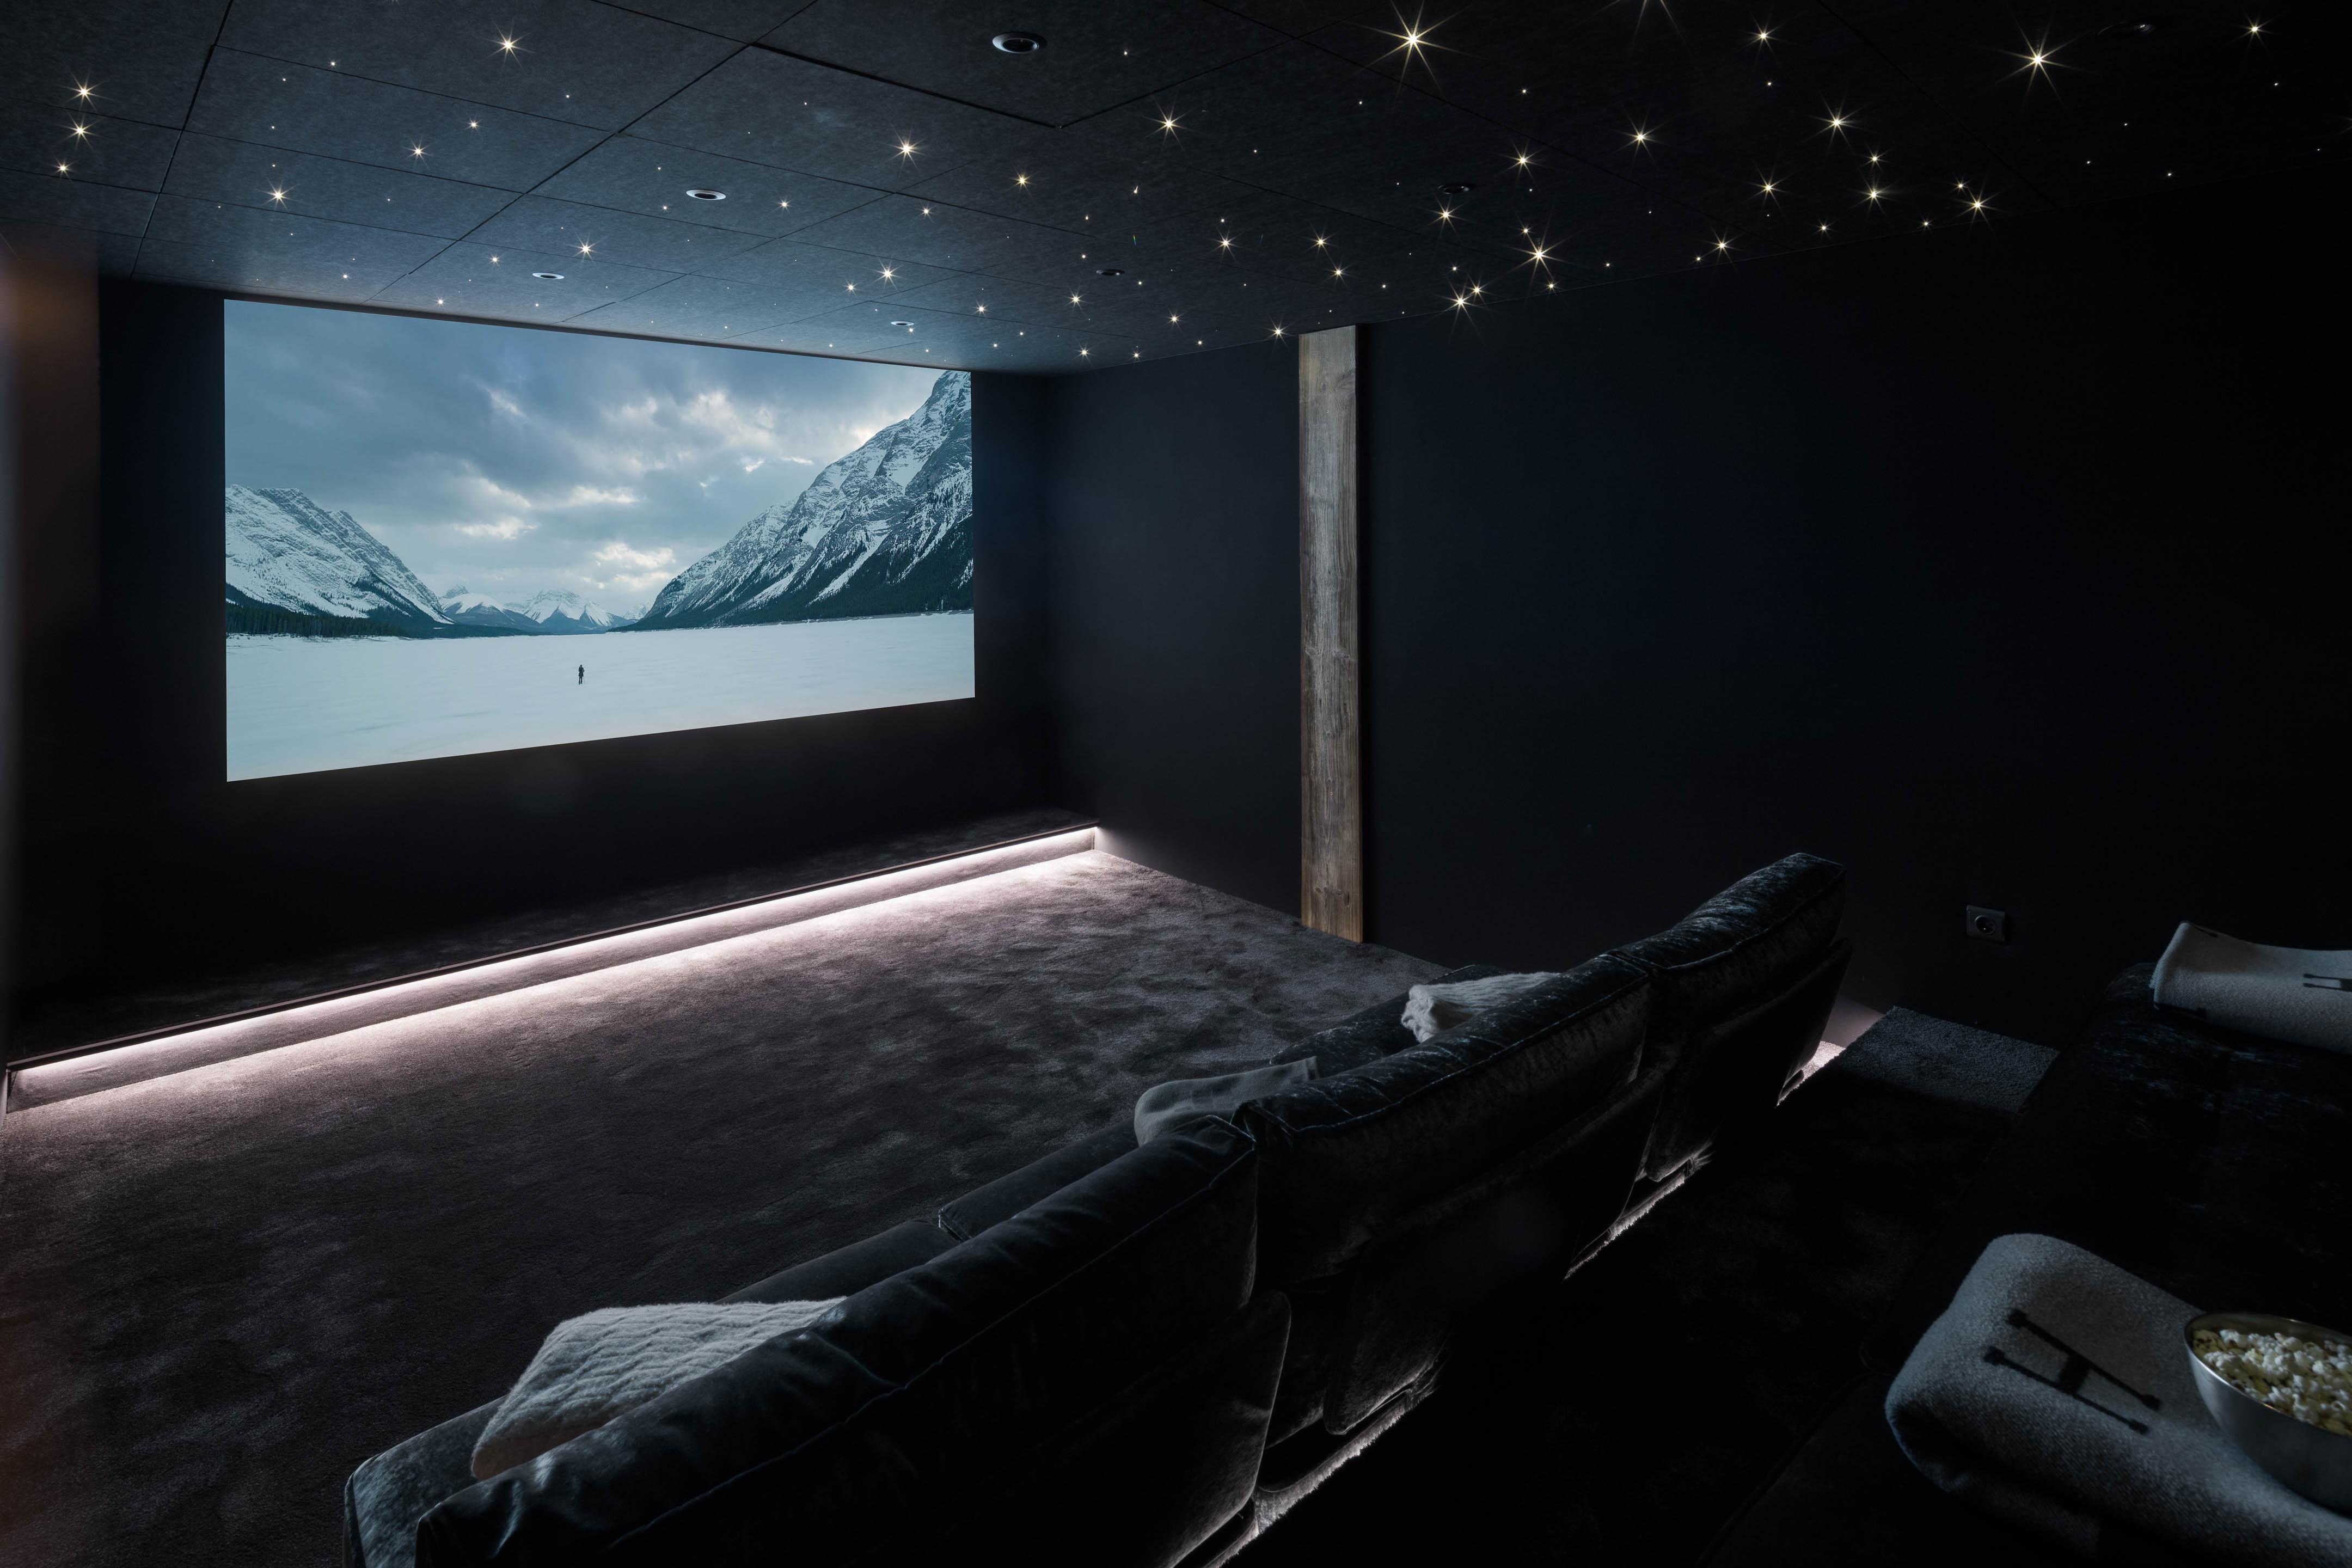 Home Acoustics Cinema Prive Home Acoustics